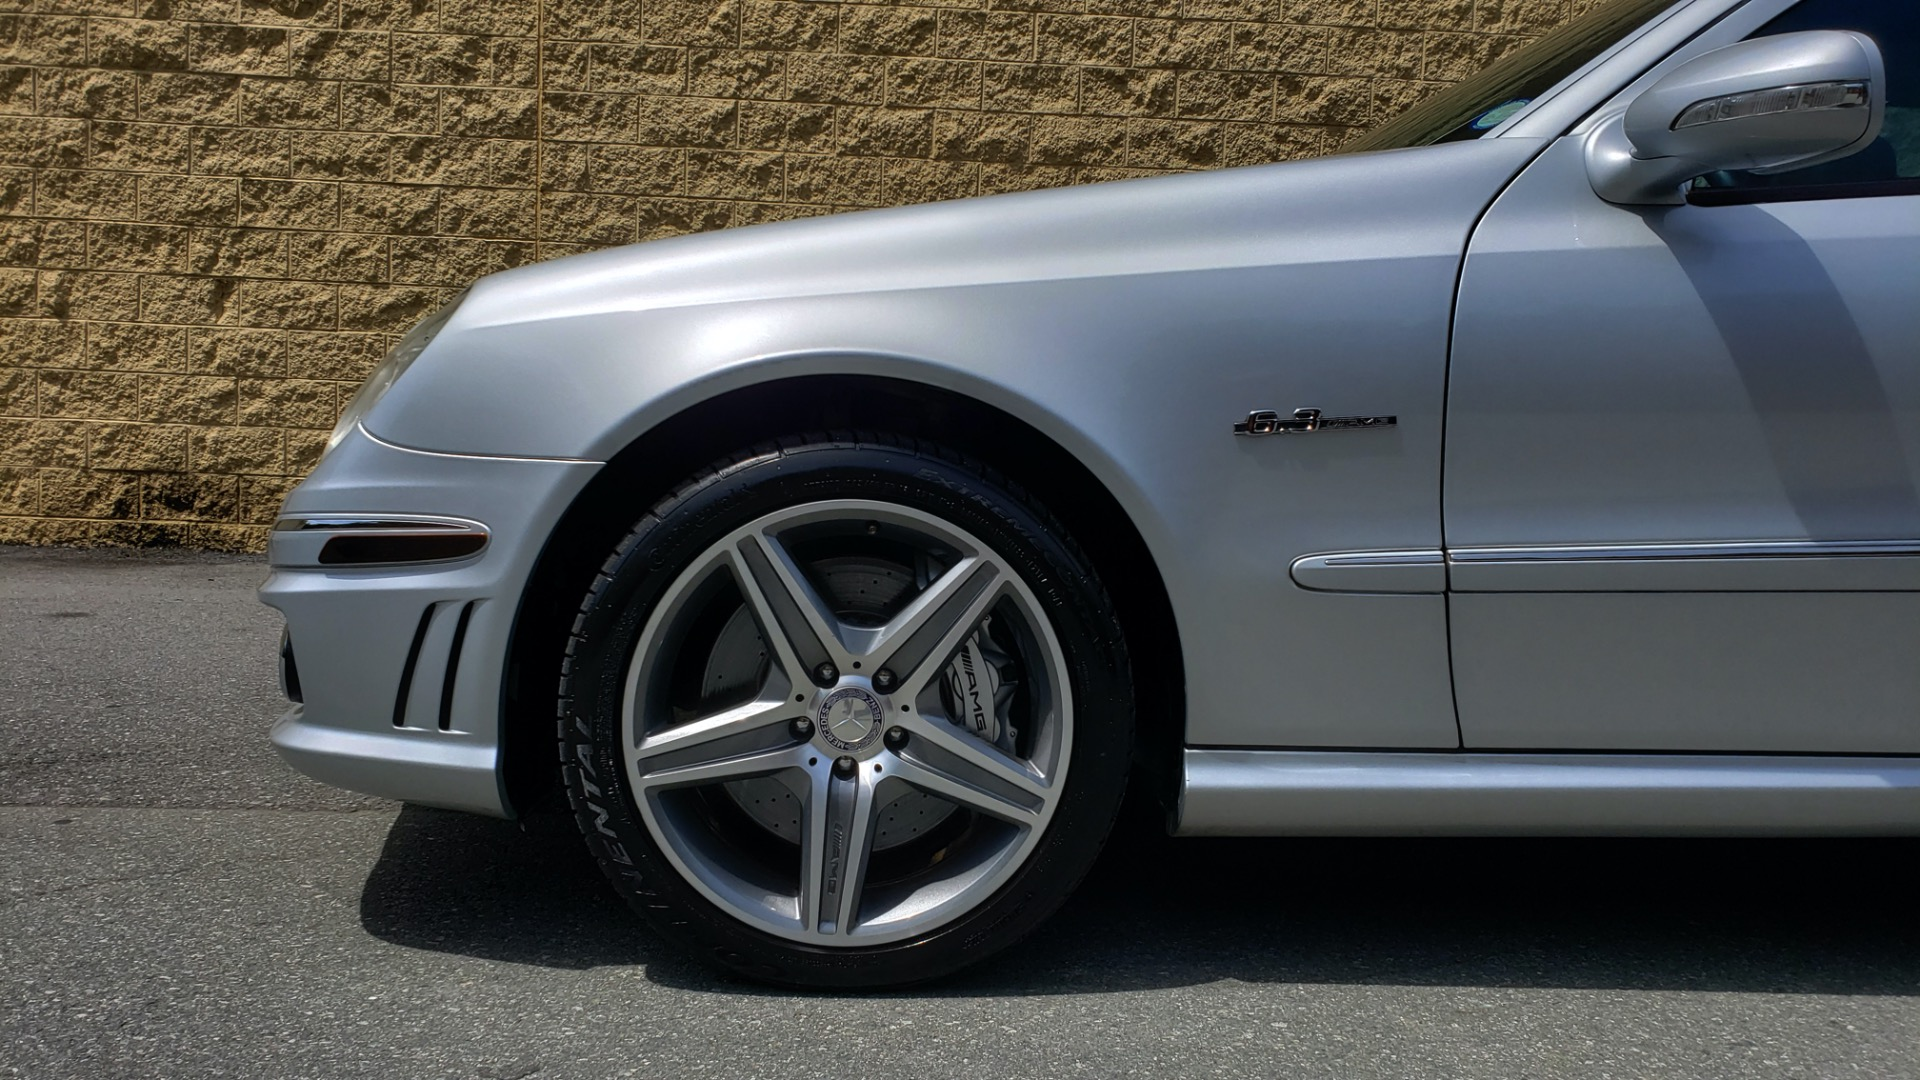 Used 2007 Mercedes-Benz E-Class E63 AMG WAGON / NAV / SUNROOF / HARMAN/KARDON for sale $29,000 at Formula Imports in Charlotte NC 28227 82